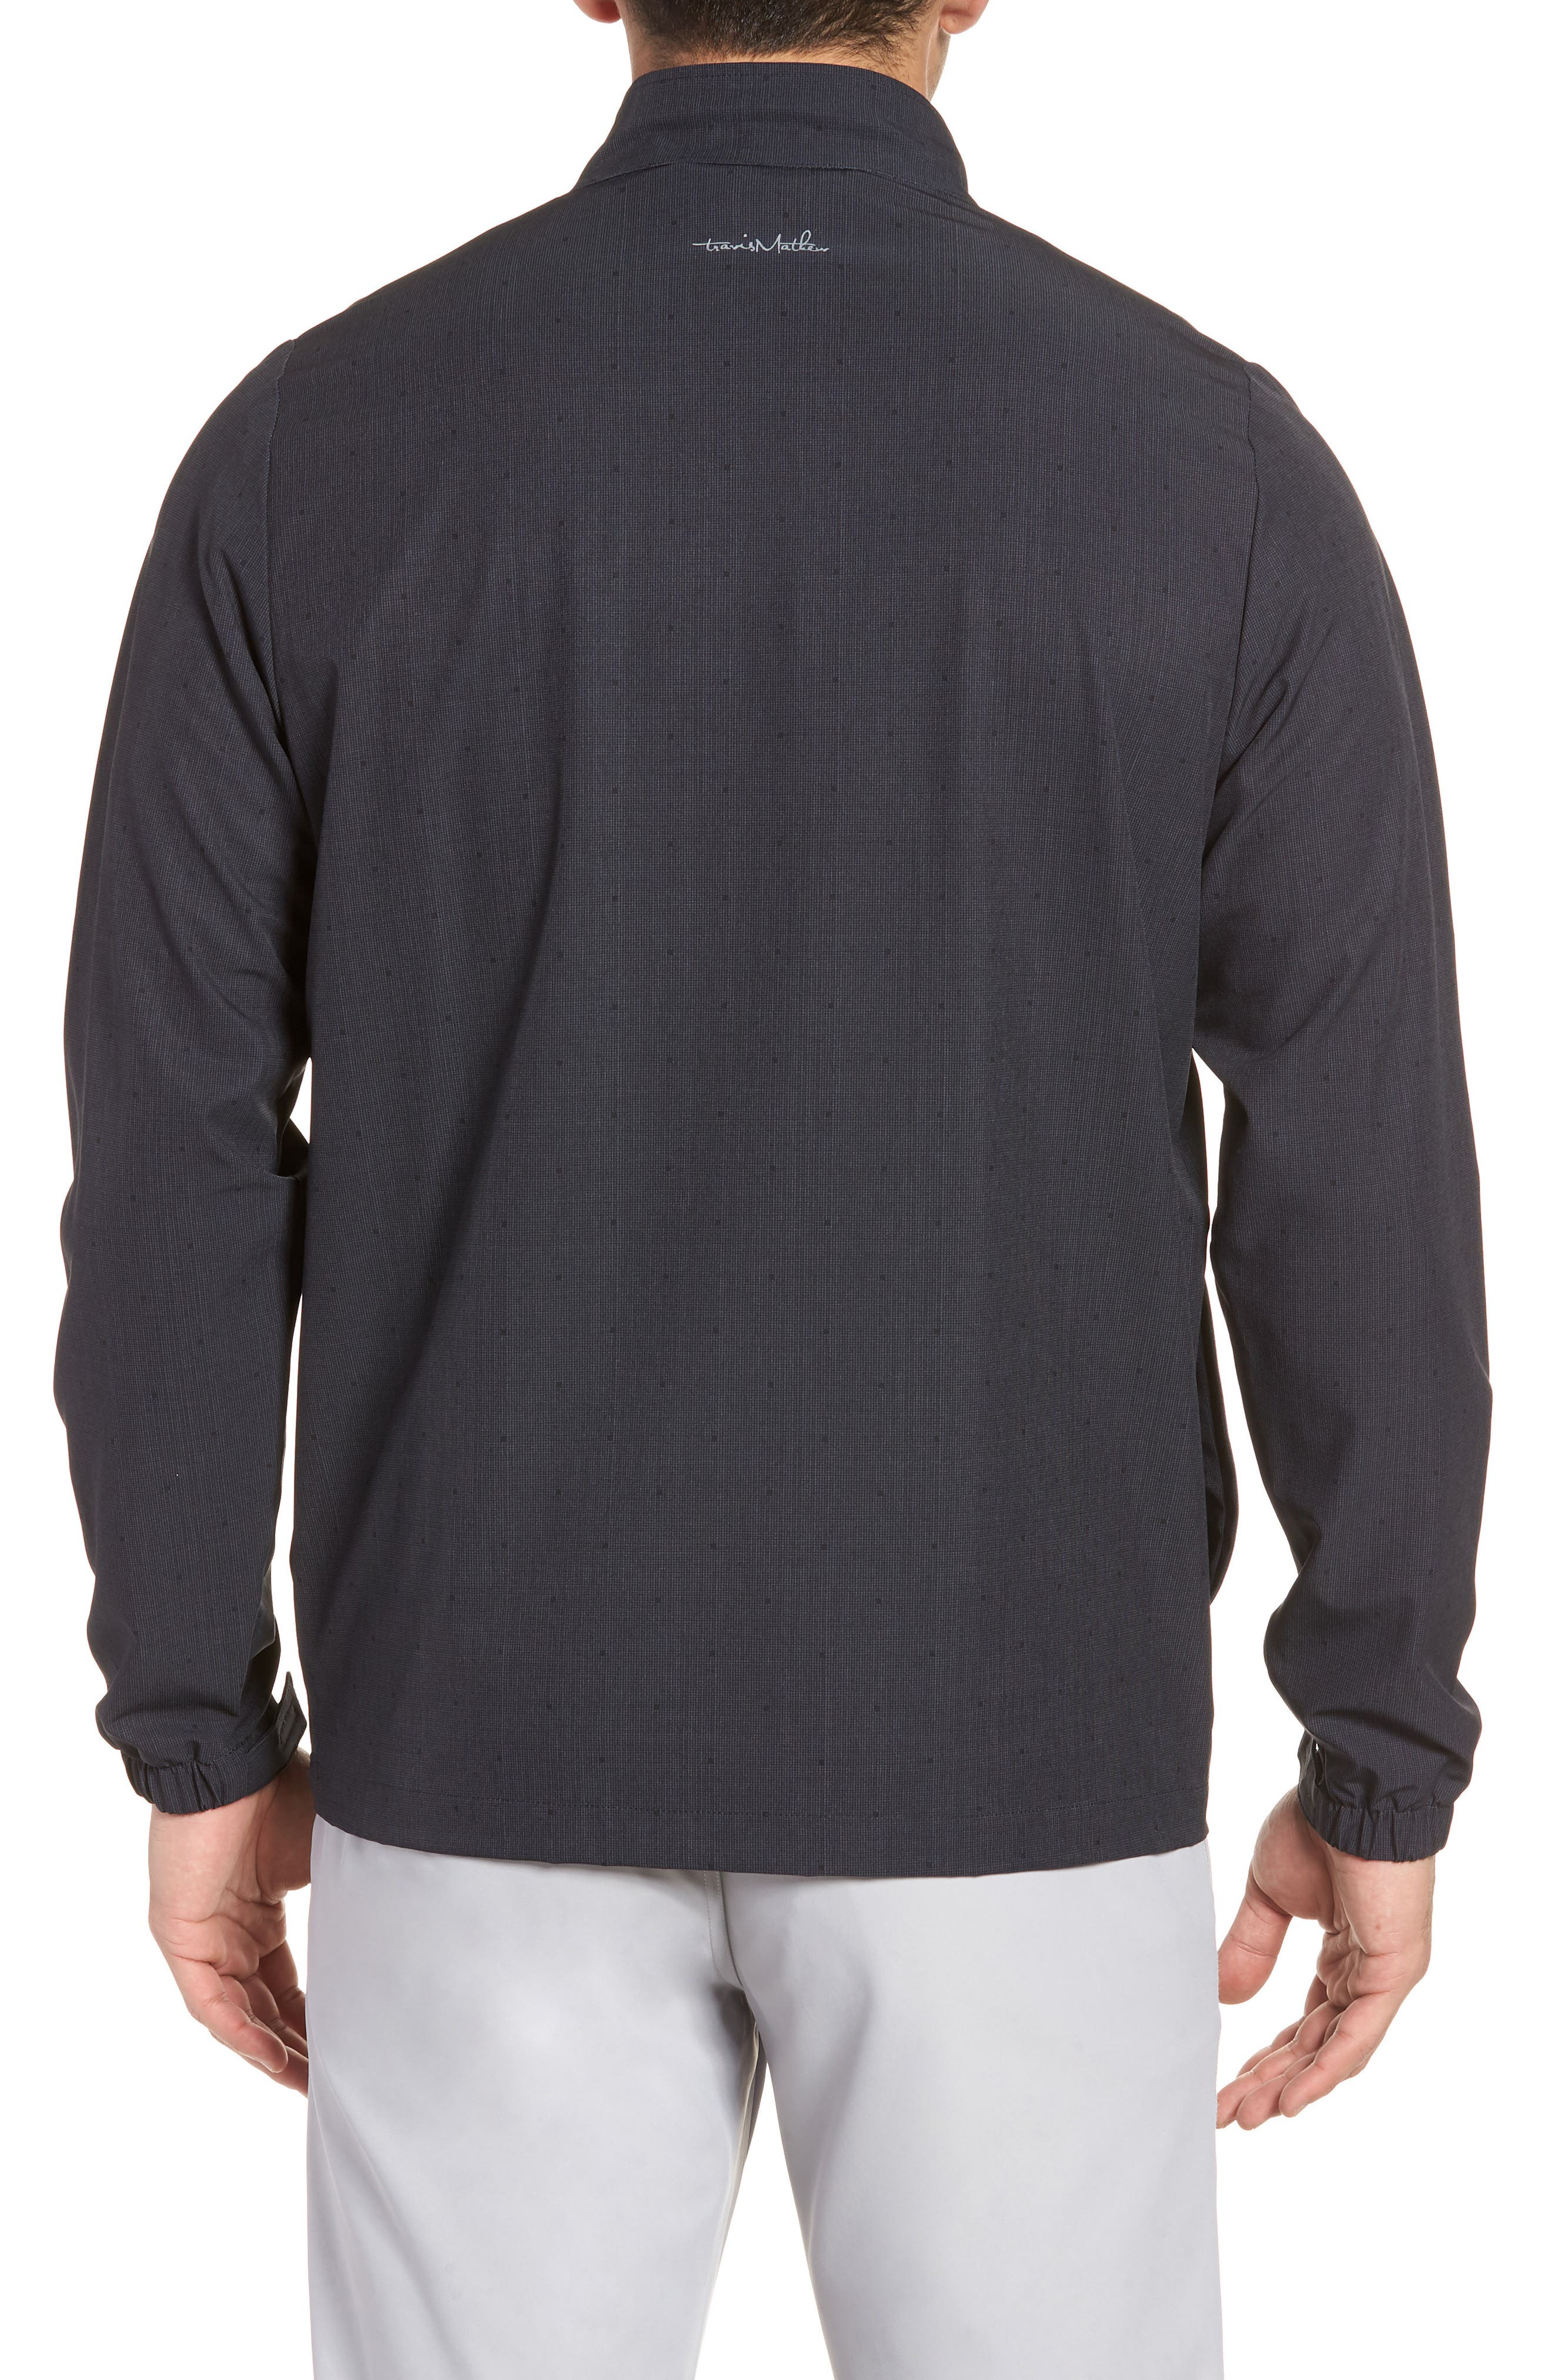 Agave Jacket,                             Alternate thumbnail 3, color,                             BLACK